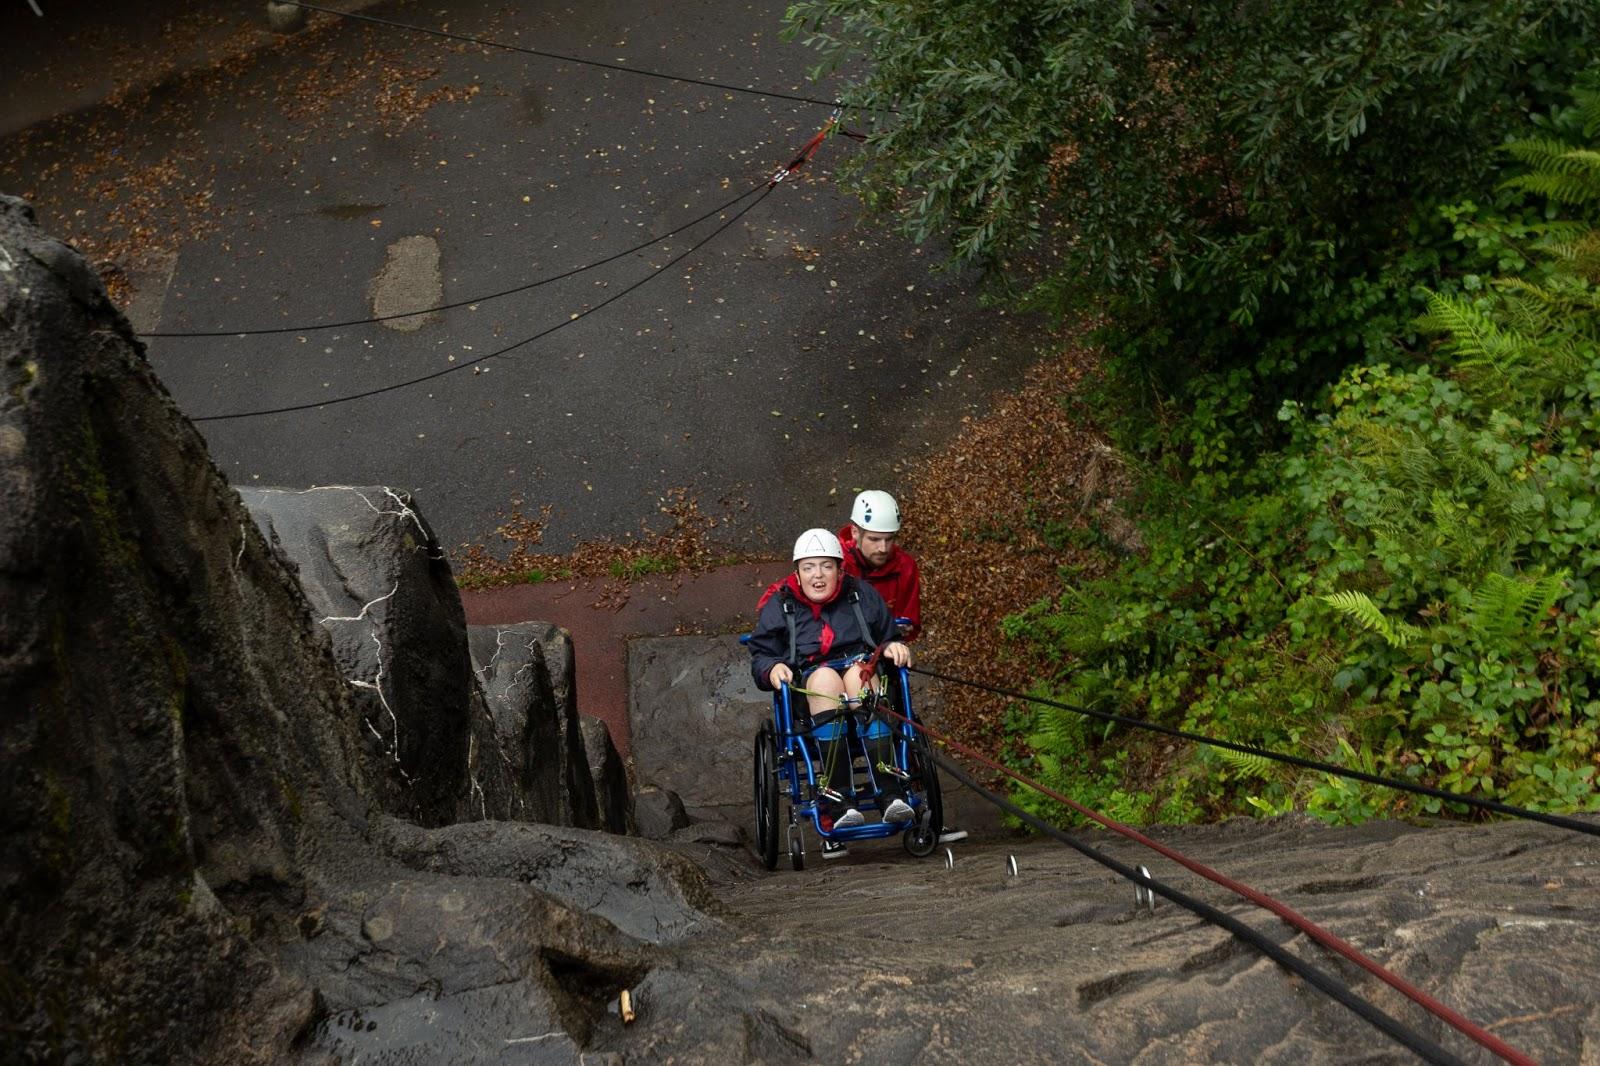 A Calvert Trust guest in a wheelchair on the abseiling wall